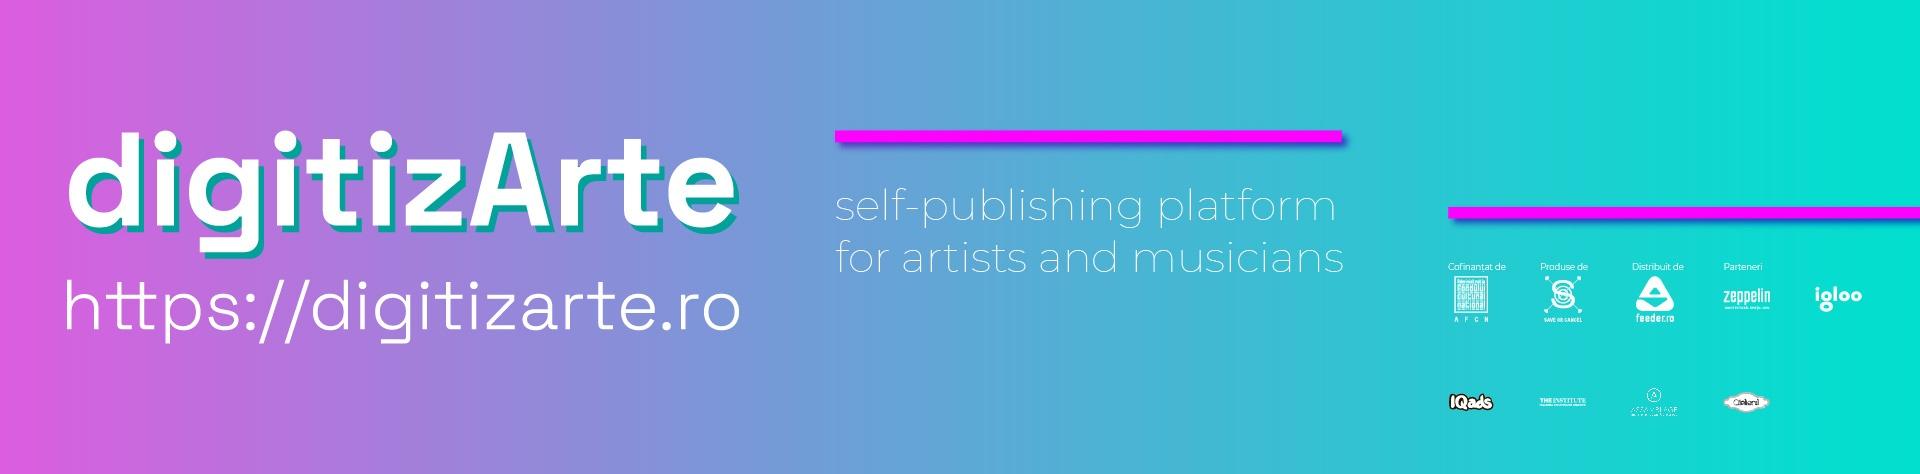 digitizArte self-publishing platform https://digitizarte.ro